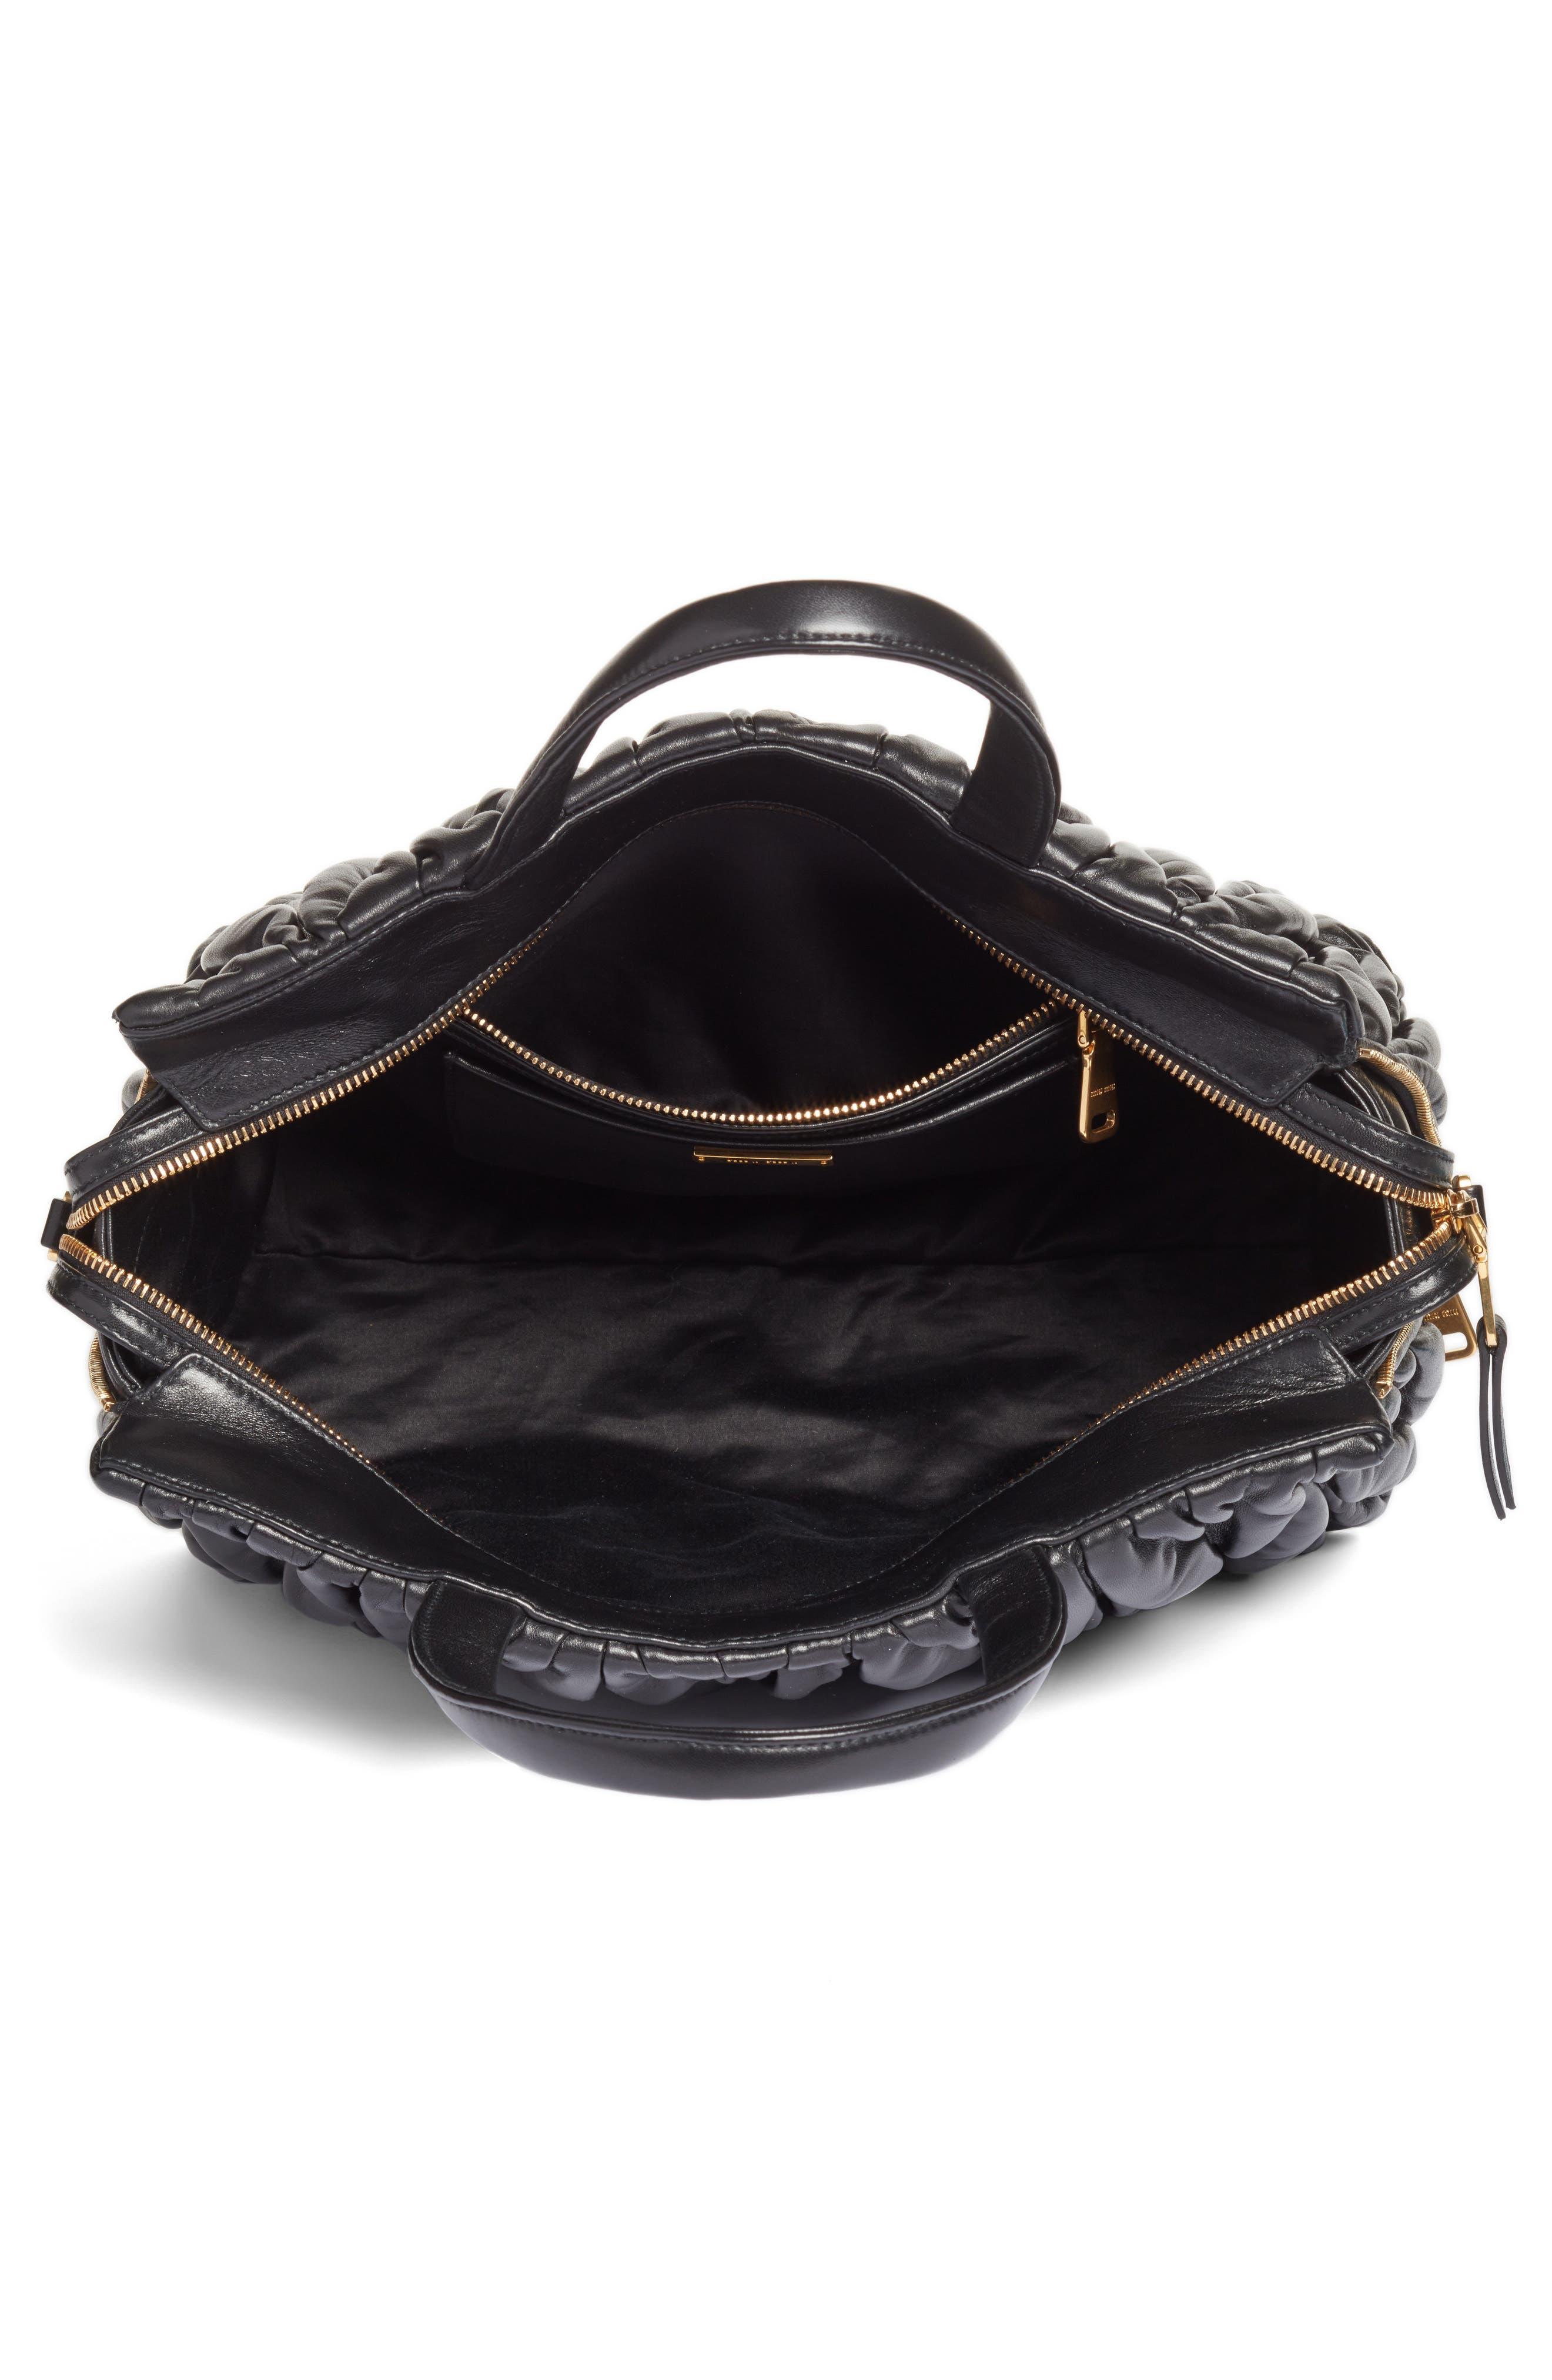 Alternate Image 3  - Miu Miu Matelassé Leather Top Handle Satchel